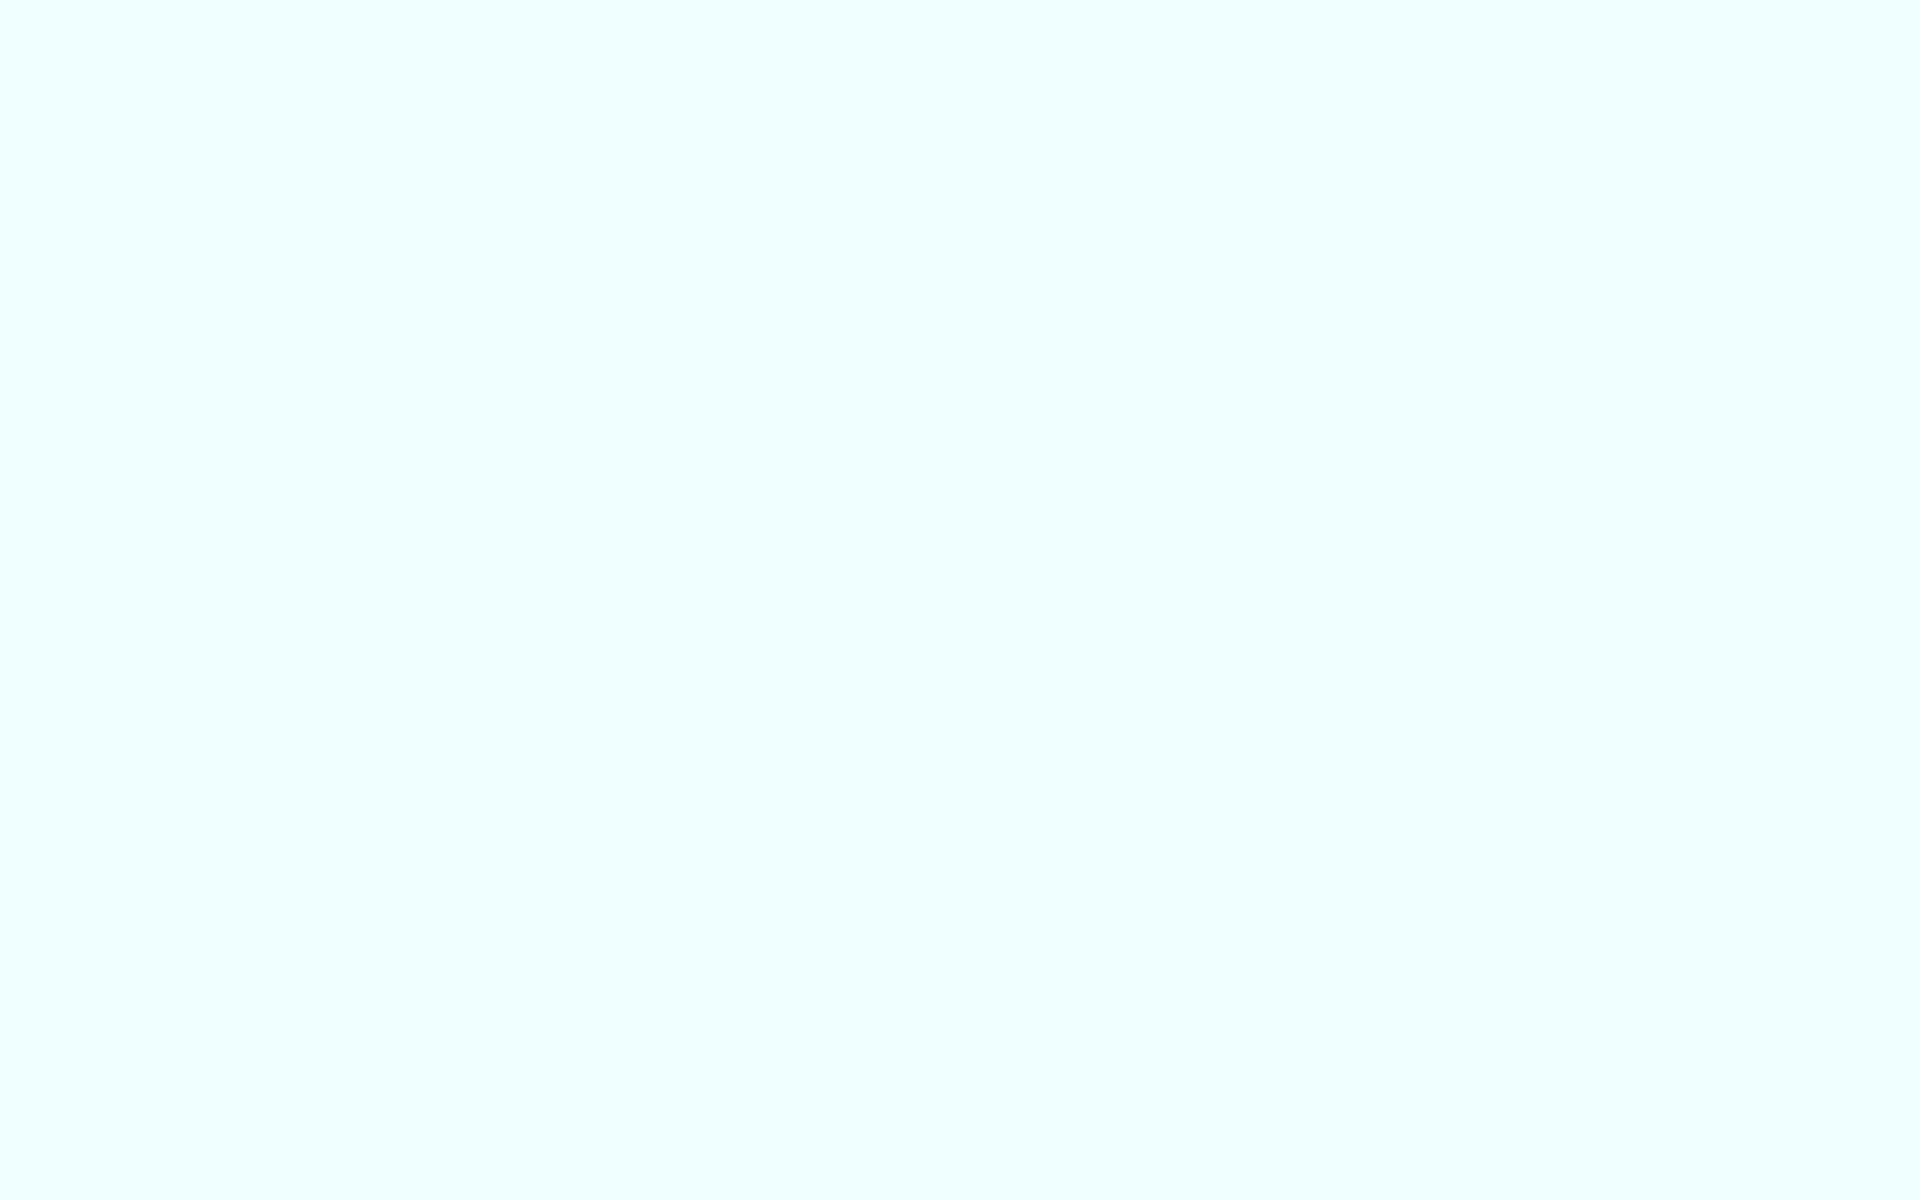 1920x1200 Azure Mist Solid Color Background